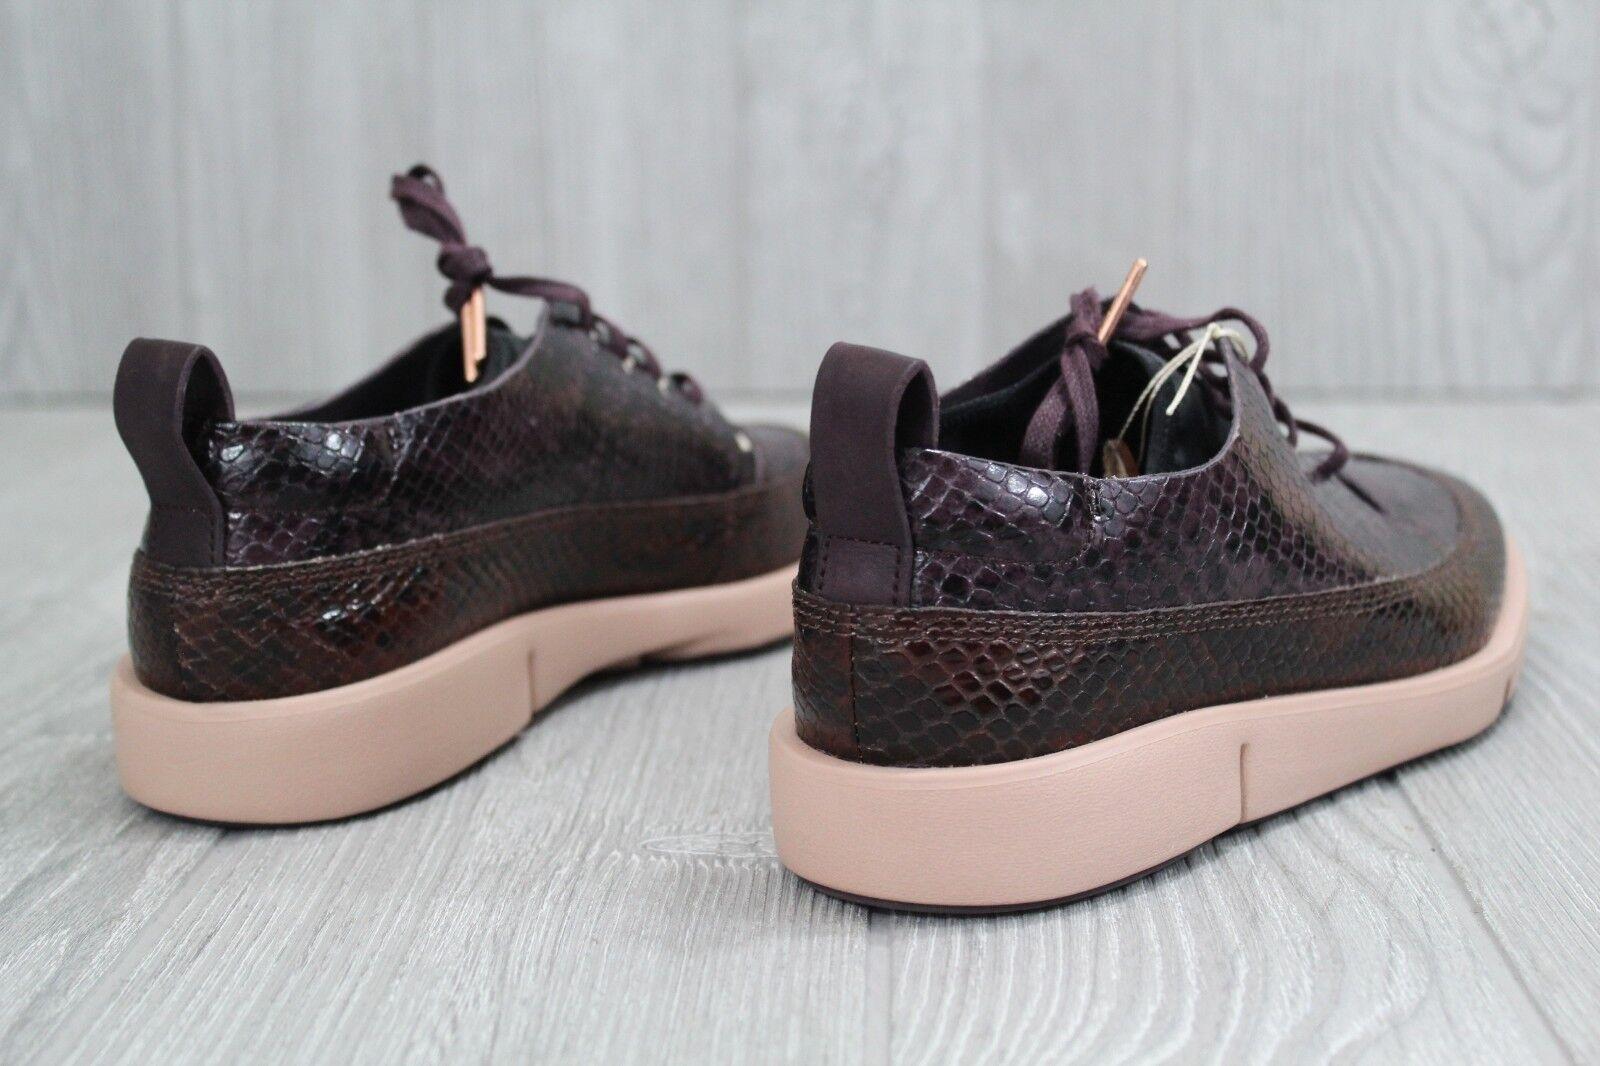 30 New Damenschuhe Clarks Tri Nia Aubergine Snake Effect Leder Trigenic Schuhes 6.5